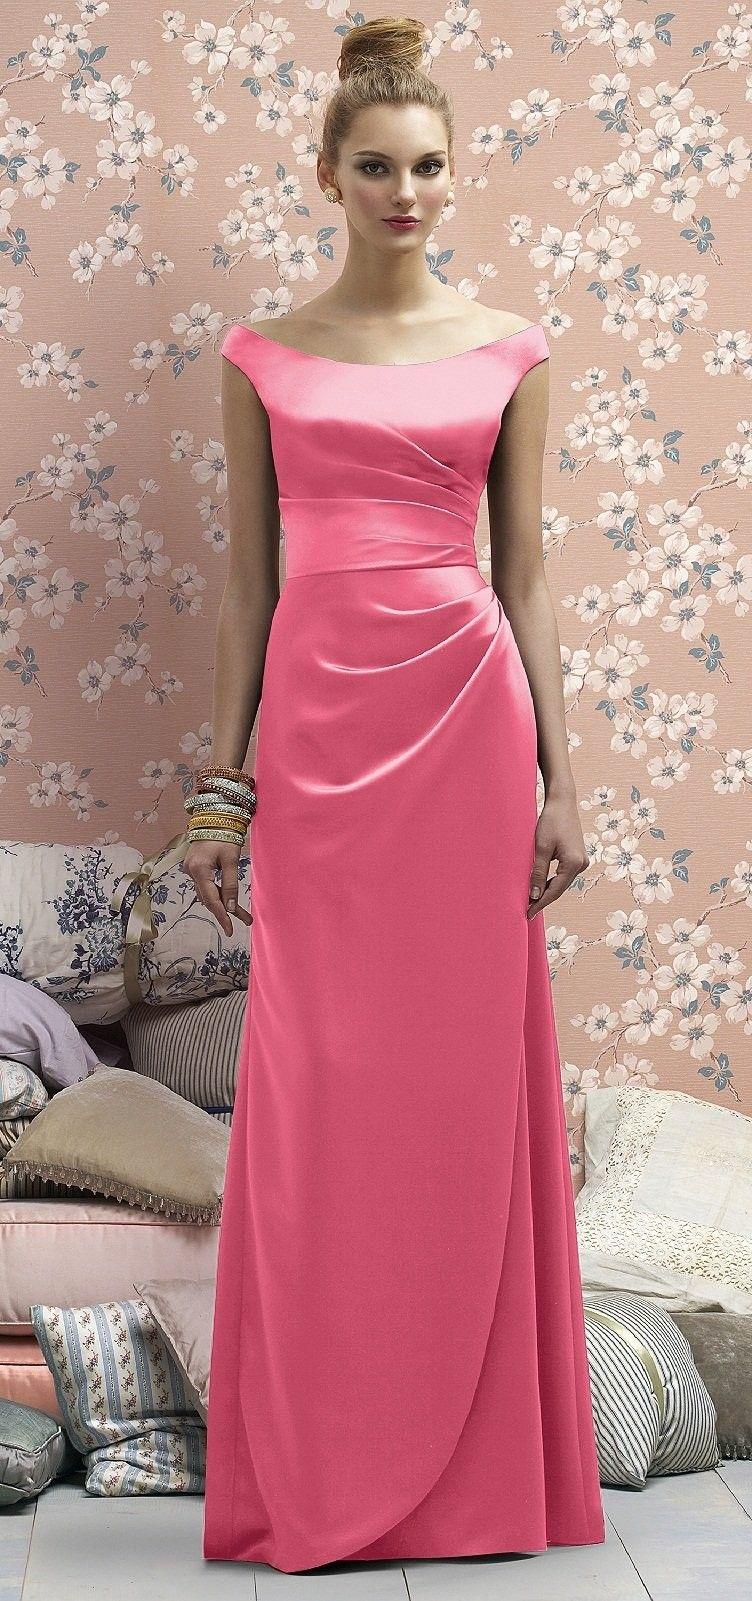 1190 - Punch | traje madrina | Pinterest | Vestido de noche rosa ...